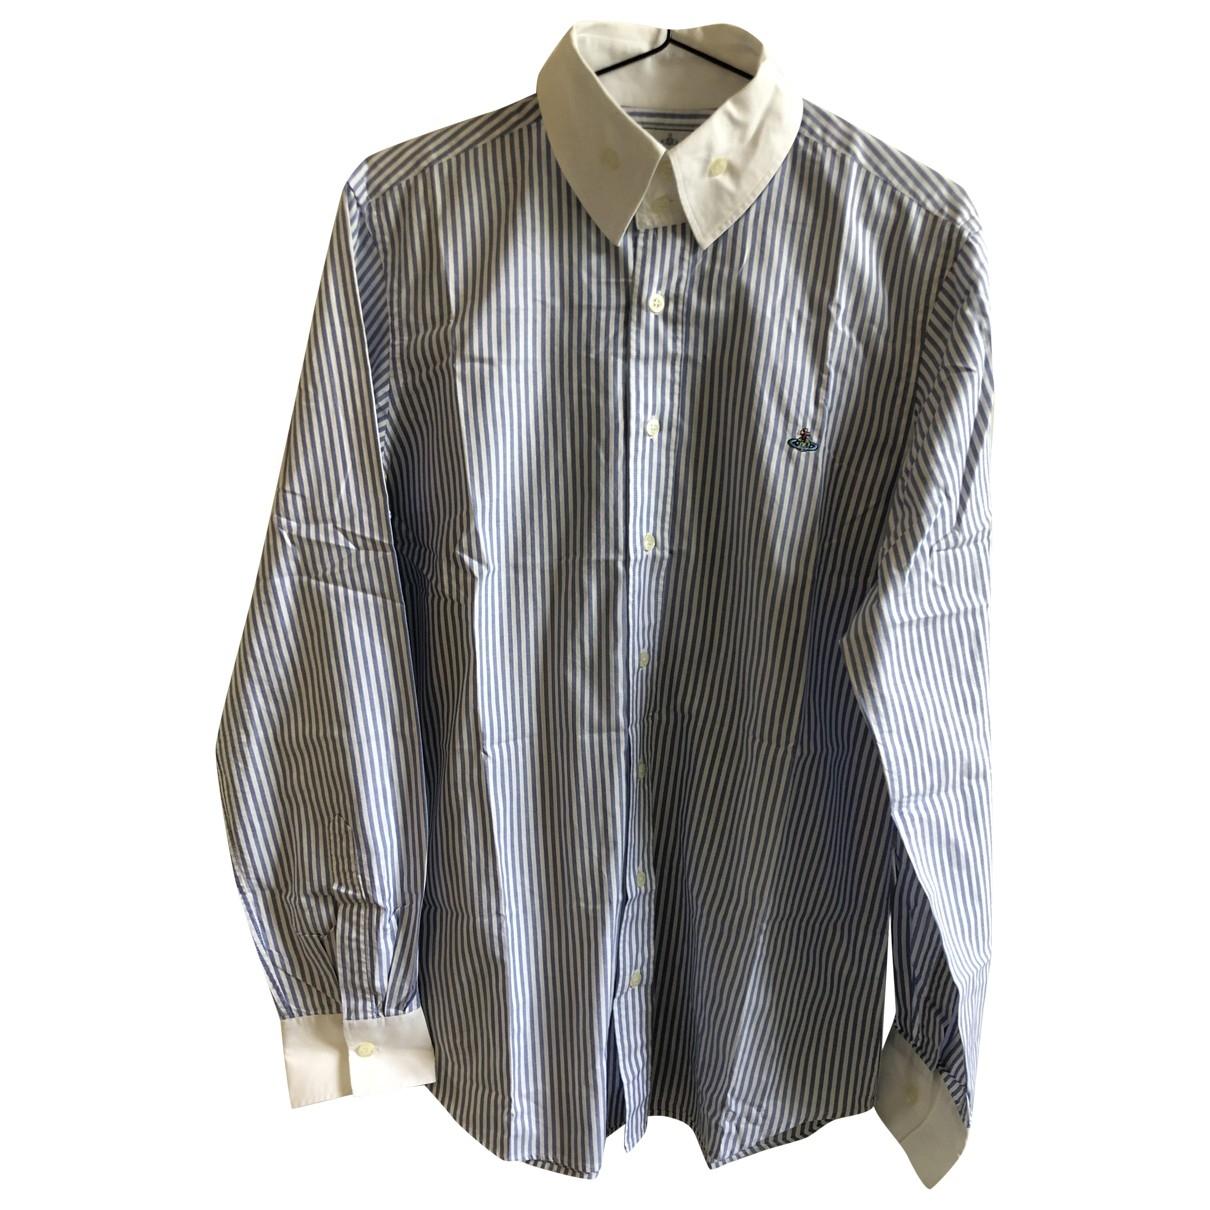 Vivienne Westwood \N Blue Cotton Shirts for Men L International